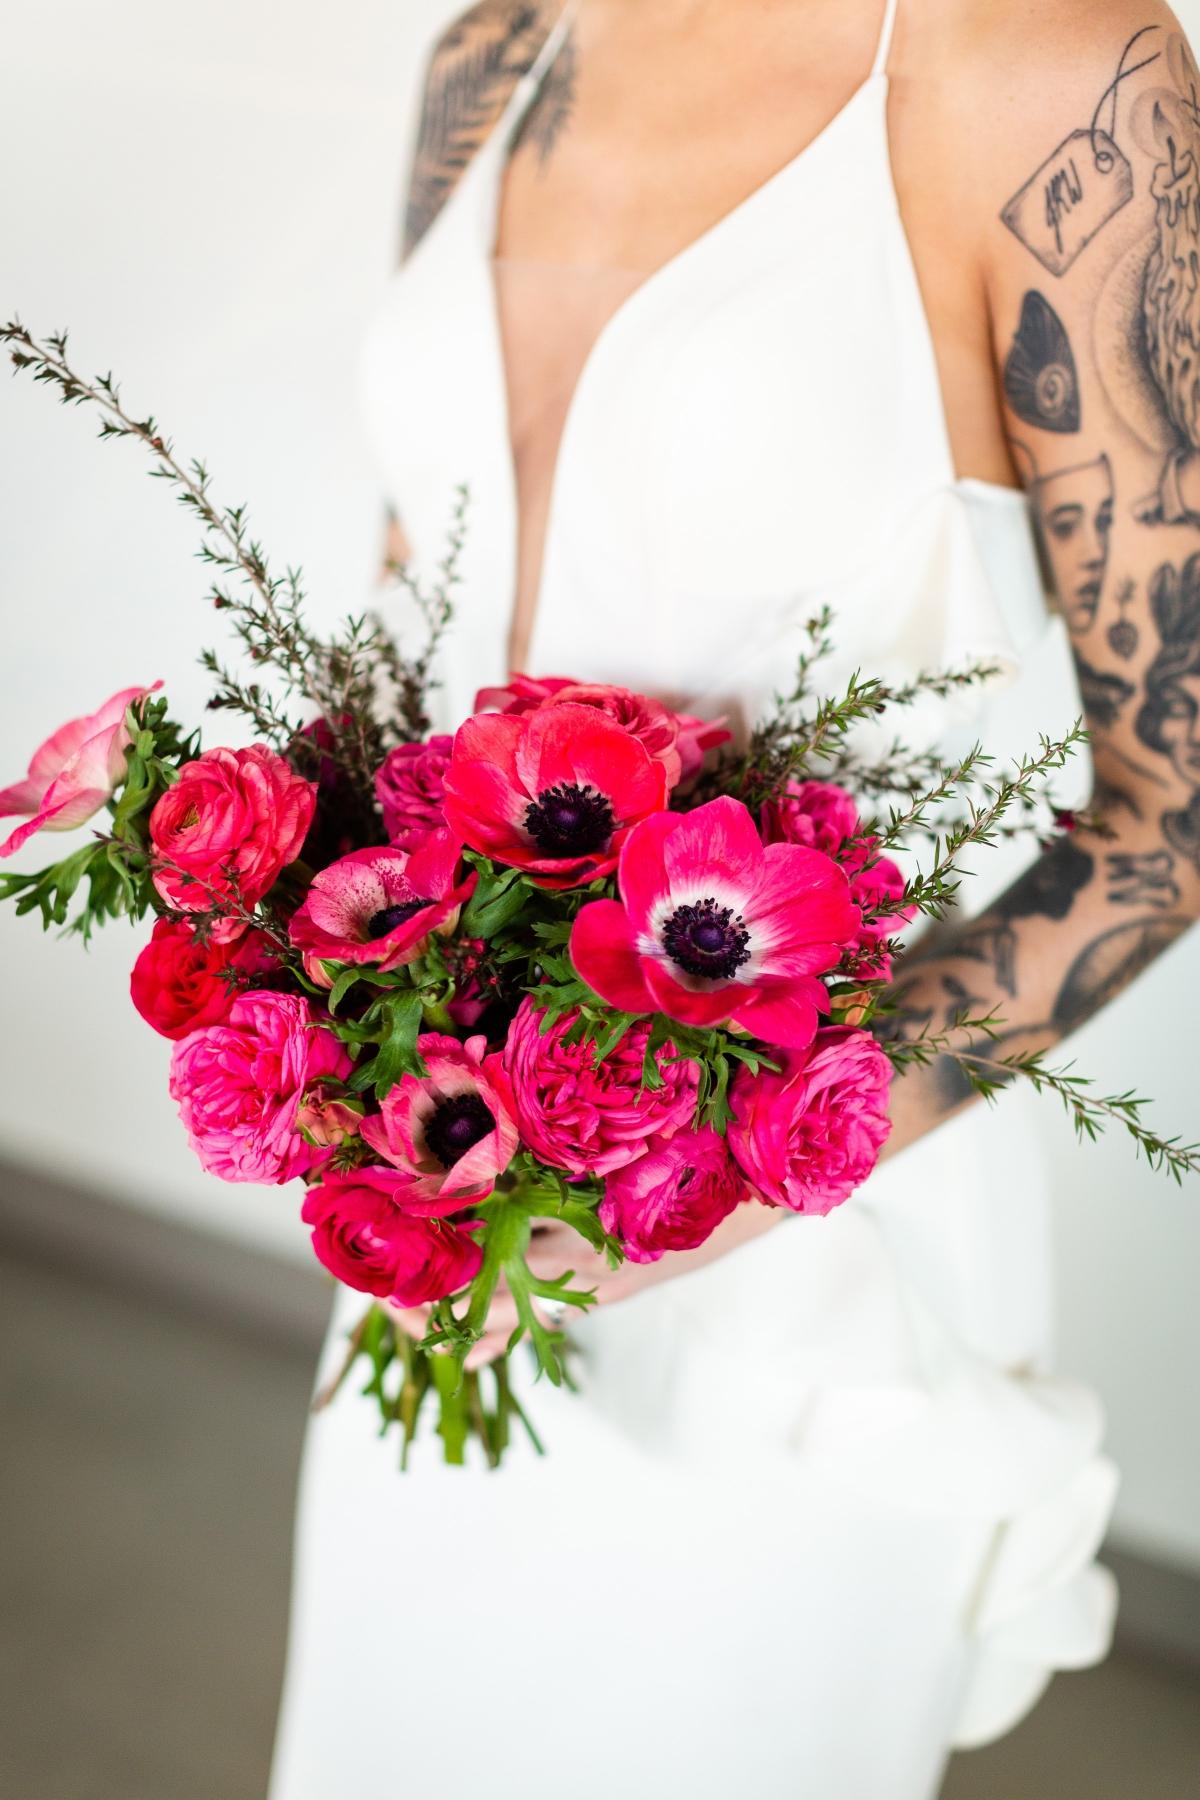 Edgy Romance Chicago Wedding Inspiration Alexandra Lee Photography Lakeshore in Love 190